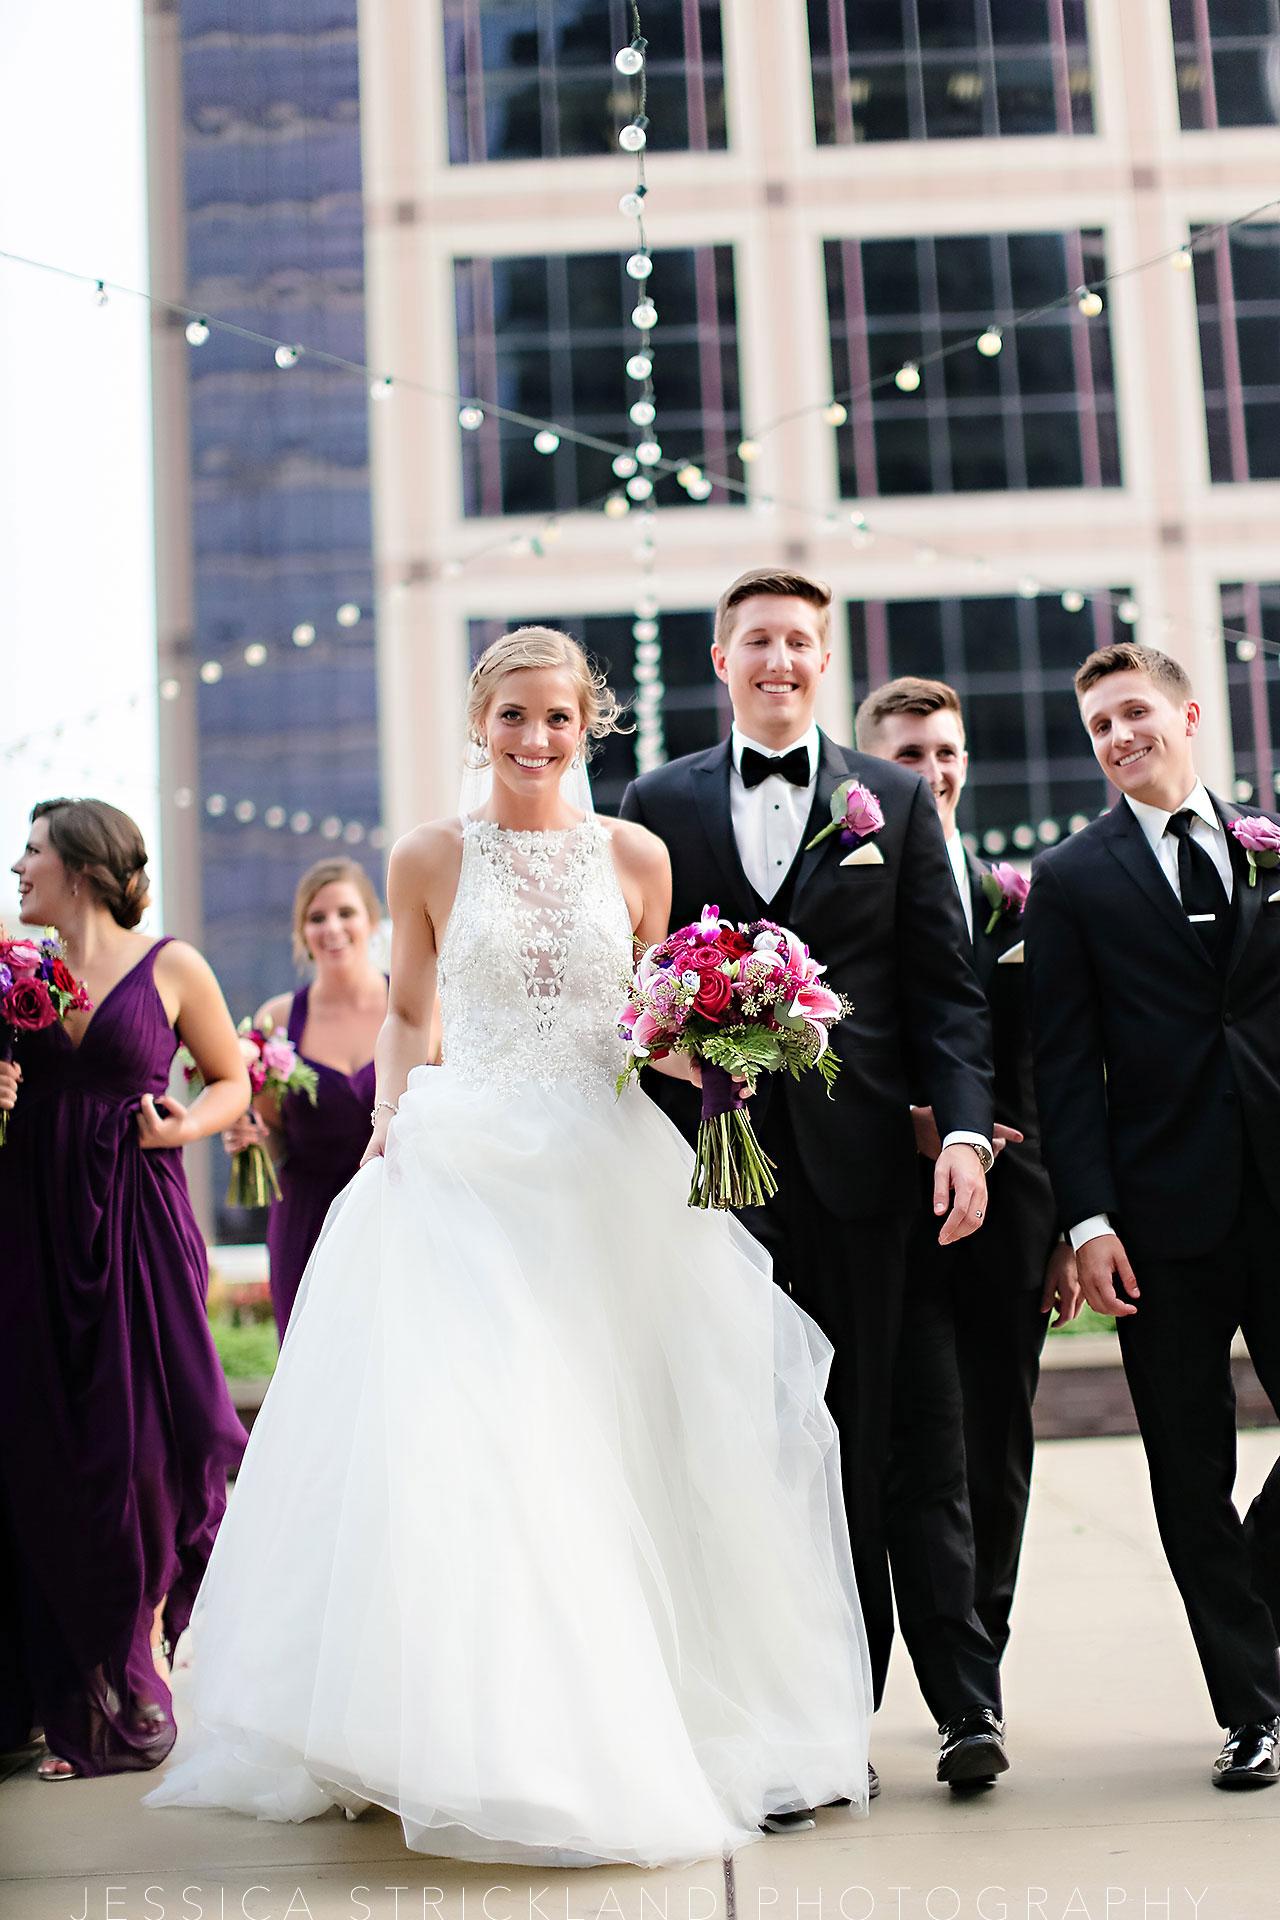 Serra Alex Regions Tower Indianapolis Wedding 210 watermarked